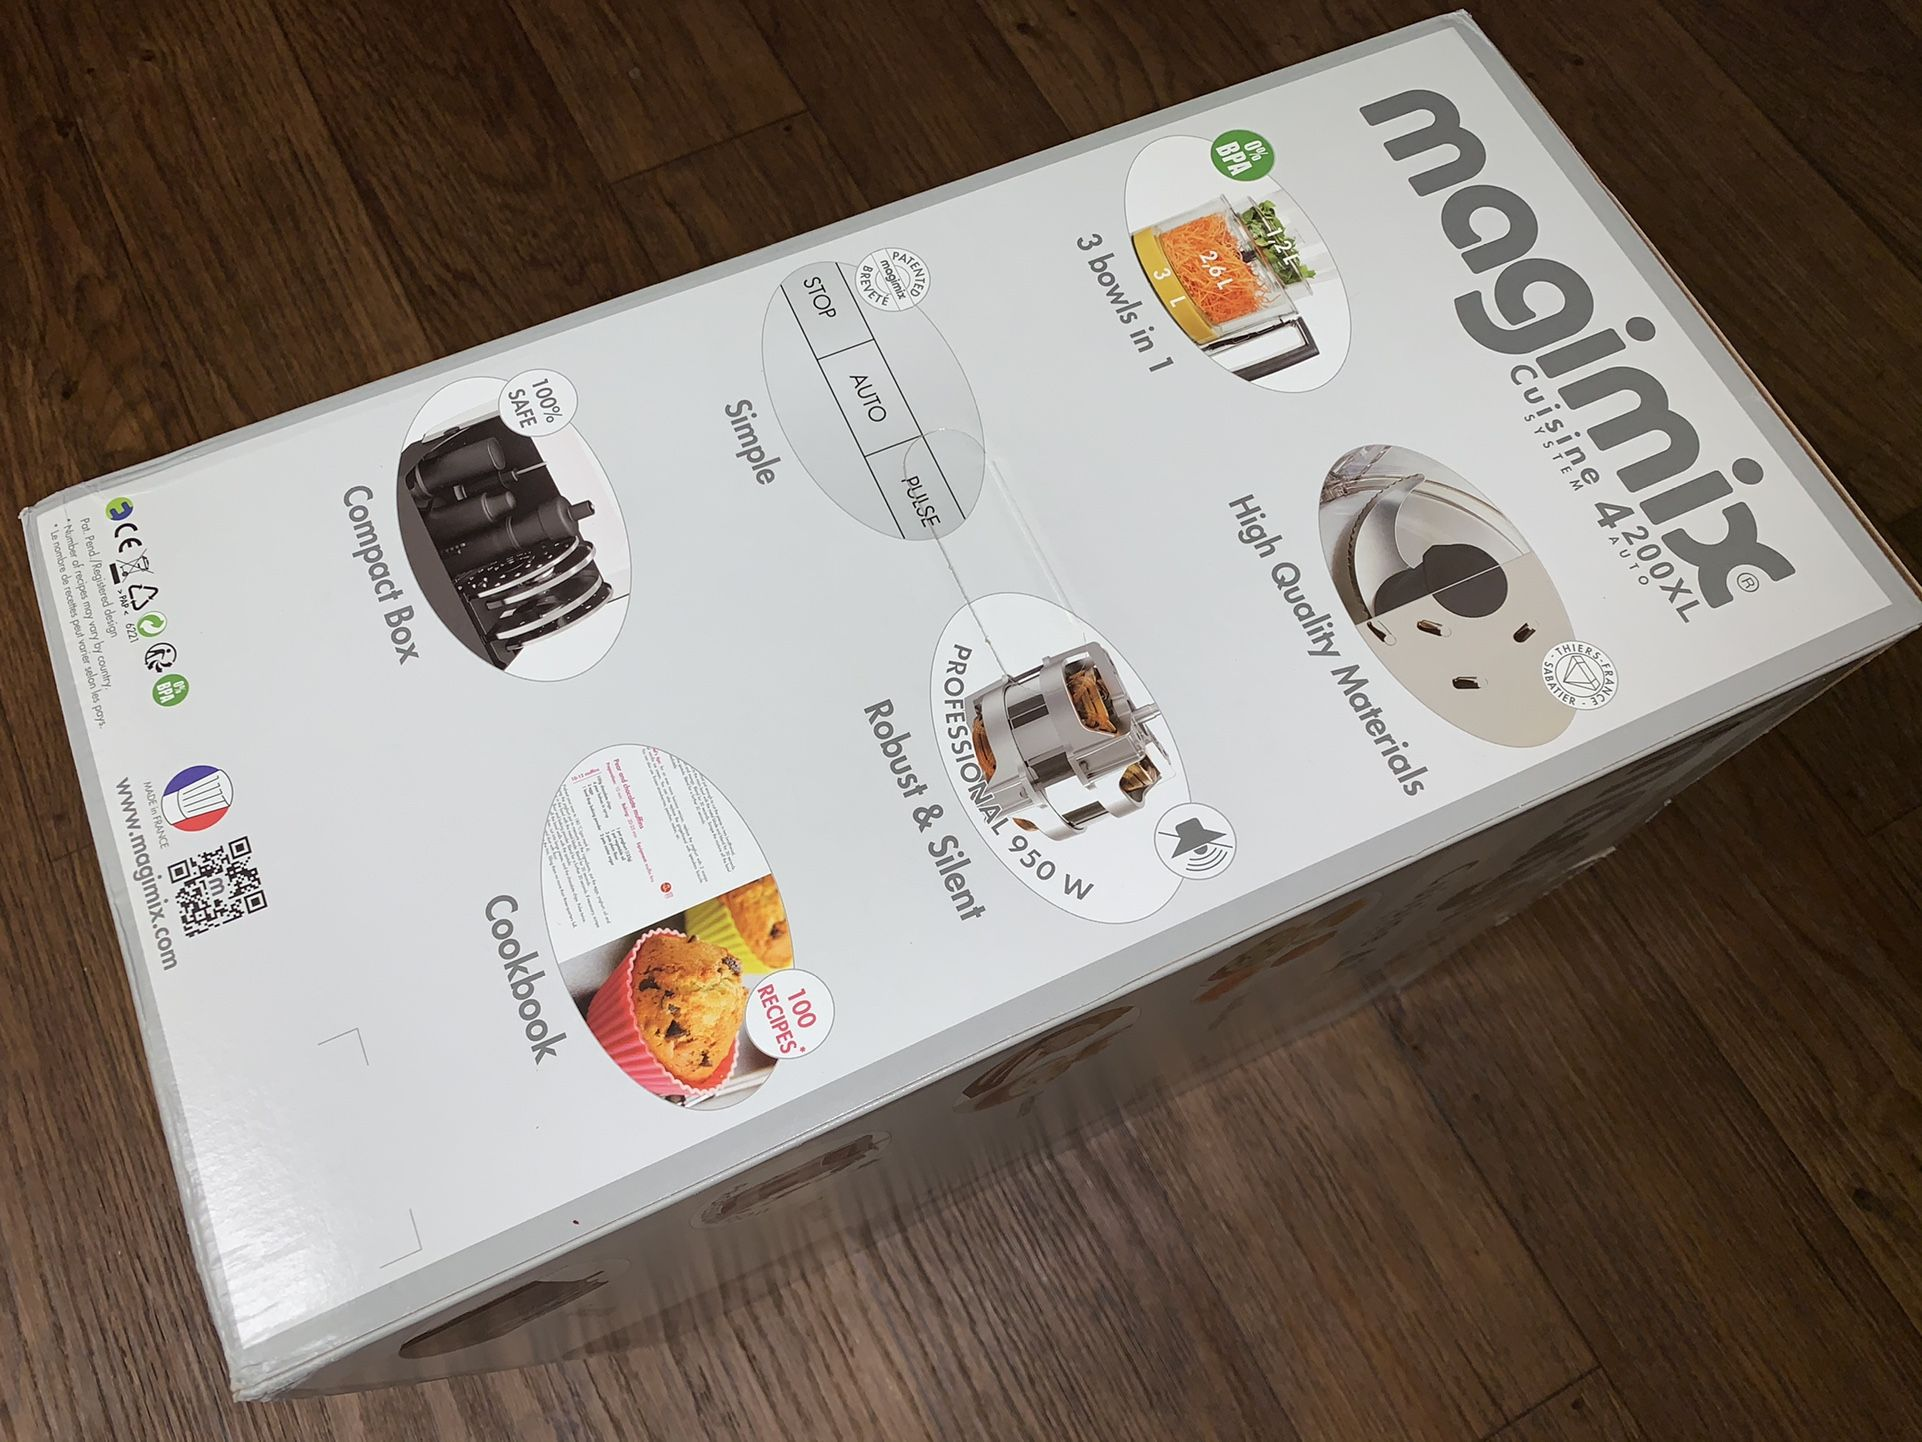 New Magimix French Food Processor Chrome CS4200XL 950 Watt Recipe Book - FIRM PRICE